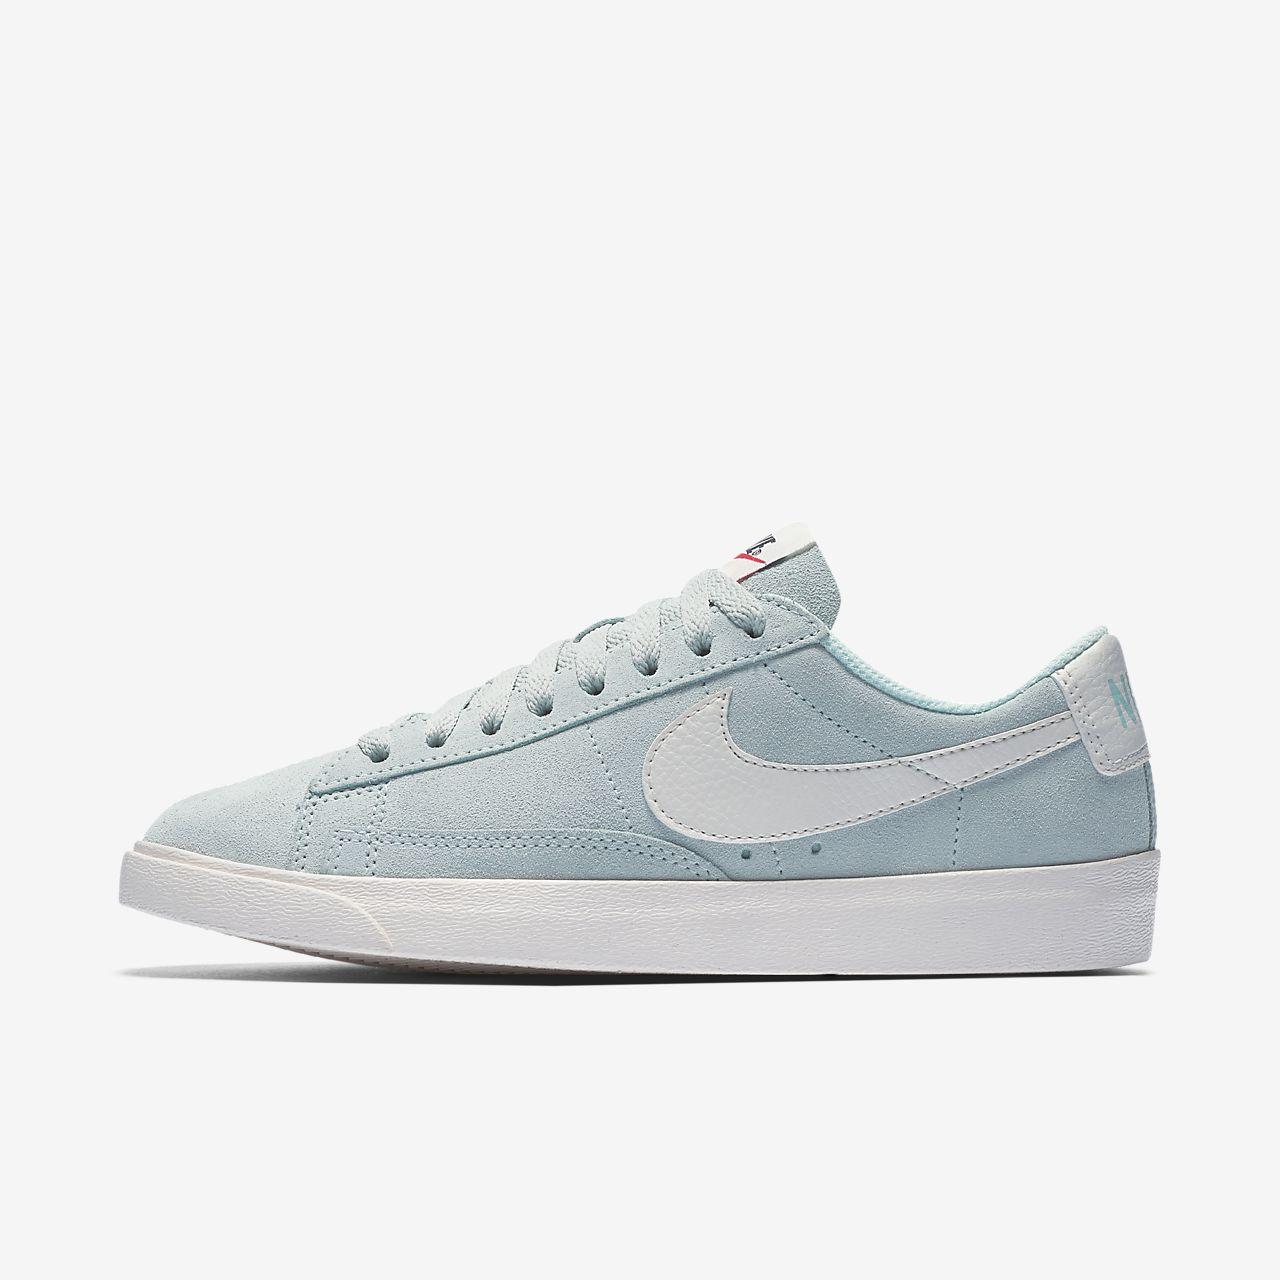 ... Nike Blazer Low Women's Shoe